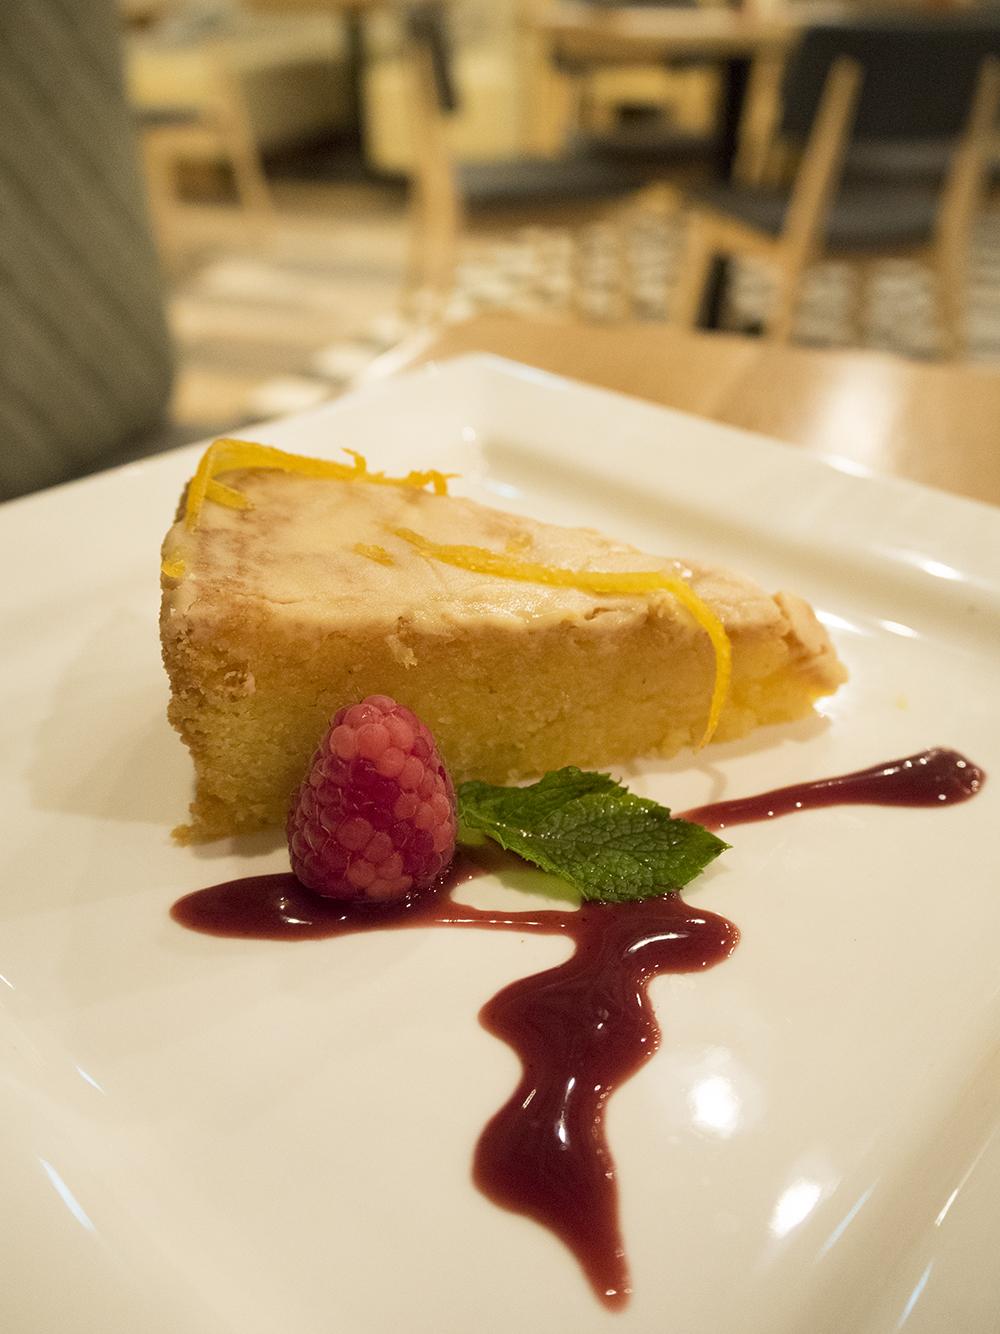 blood-orange-polenta-cake-prezzo-manchester